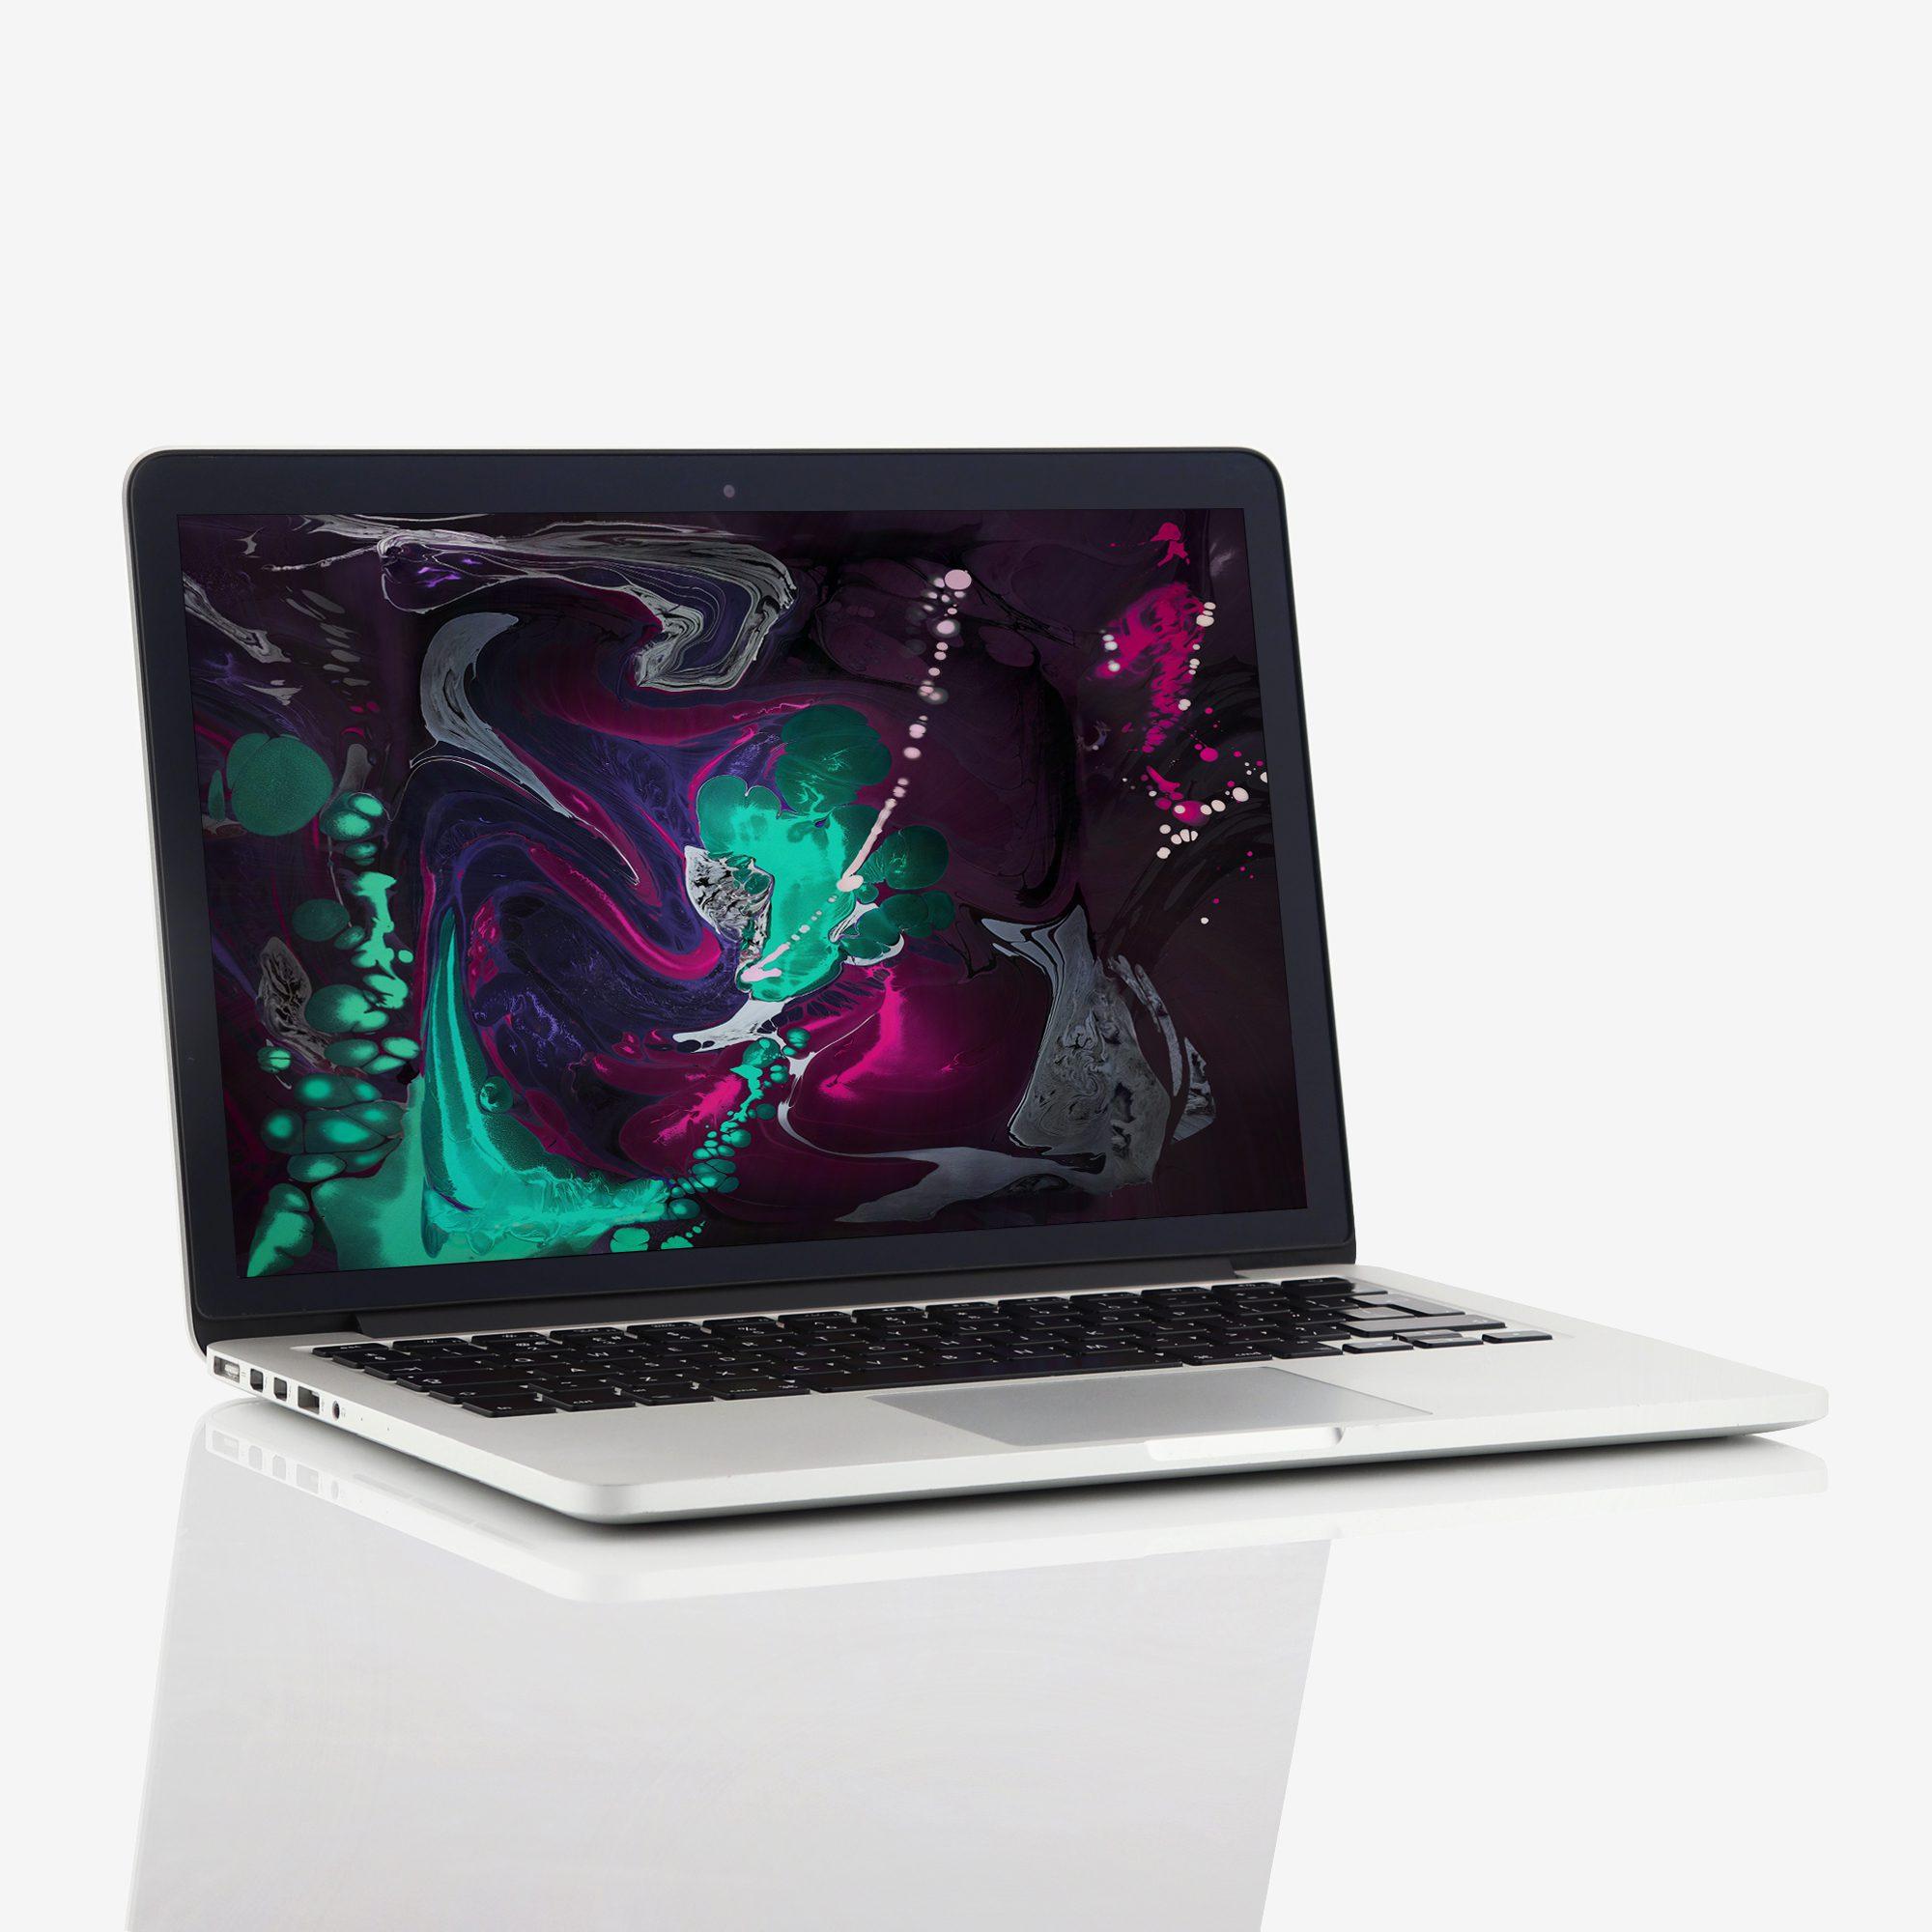 1 x Apple MacBook Pro Retina 13 Inch Intel Core i5 2.60 GHz (2014)